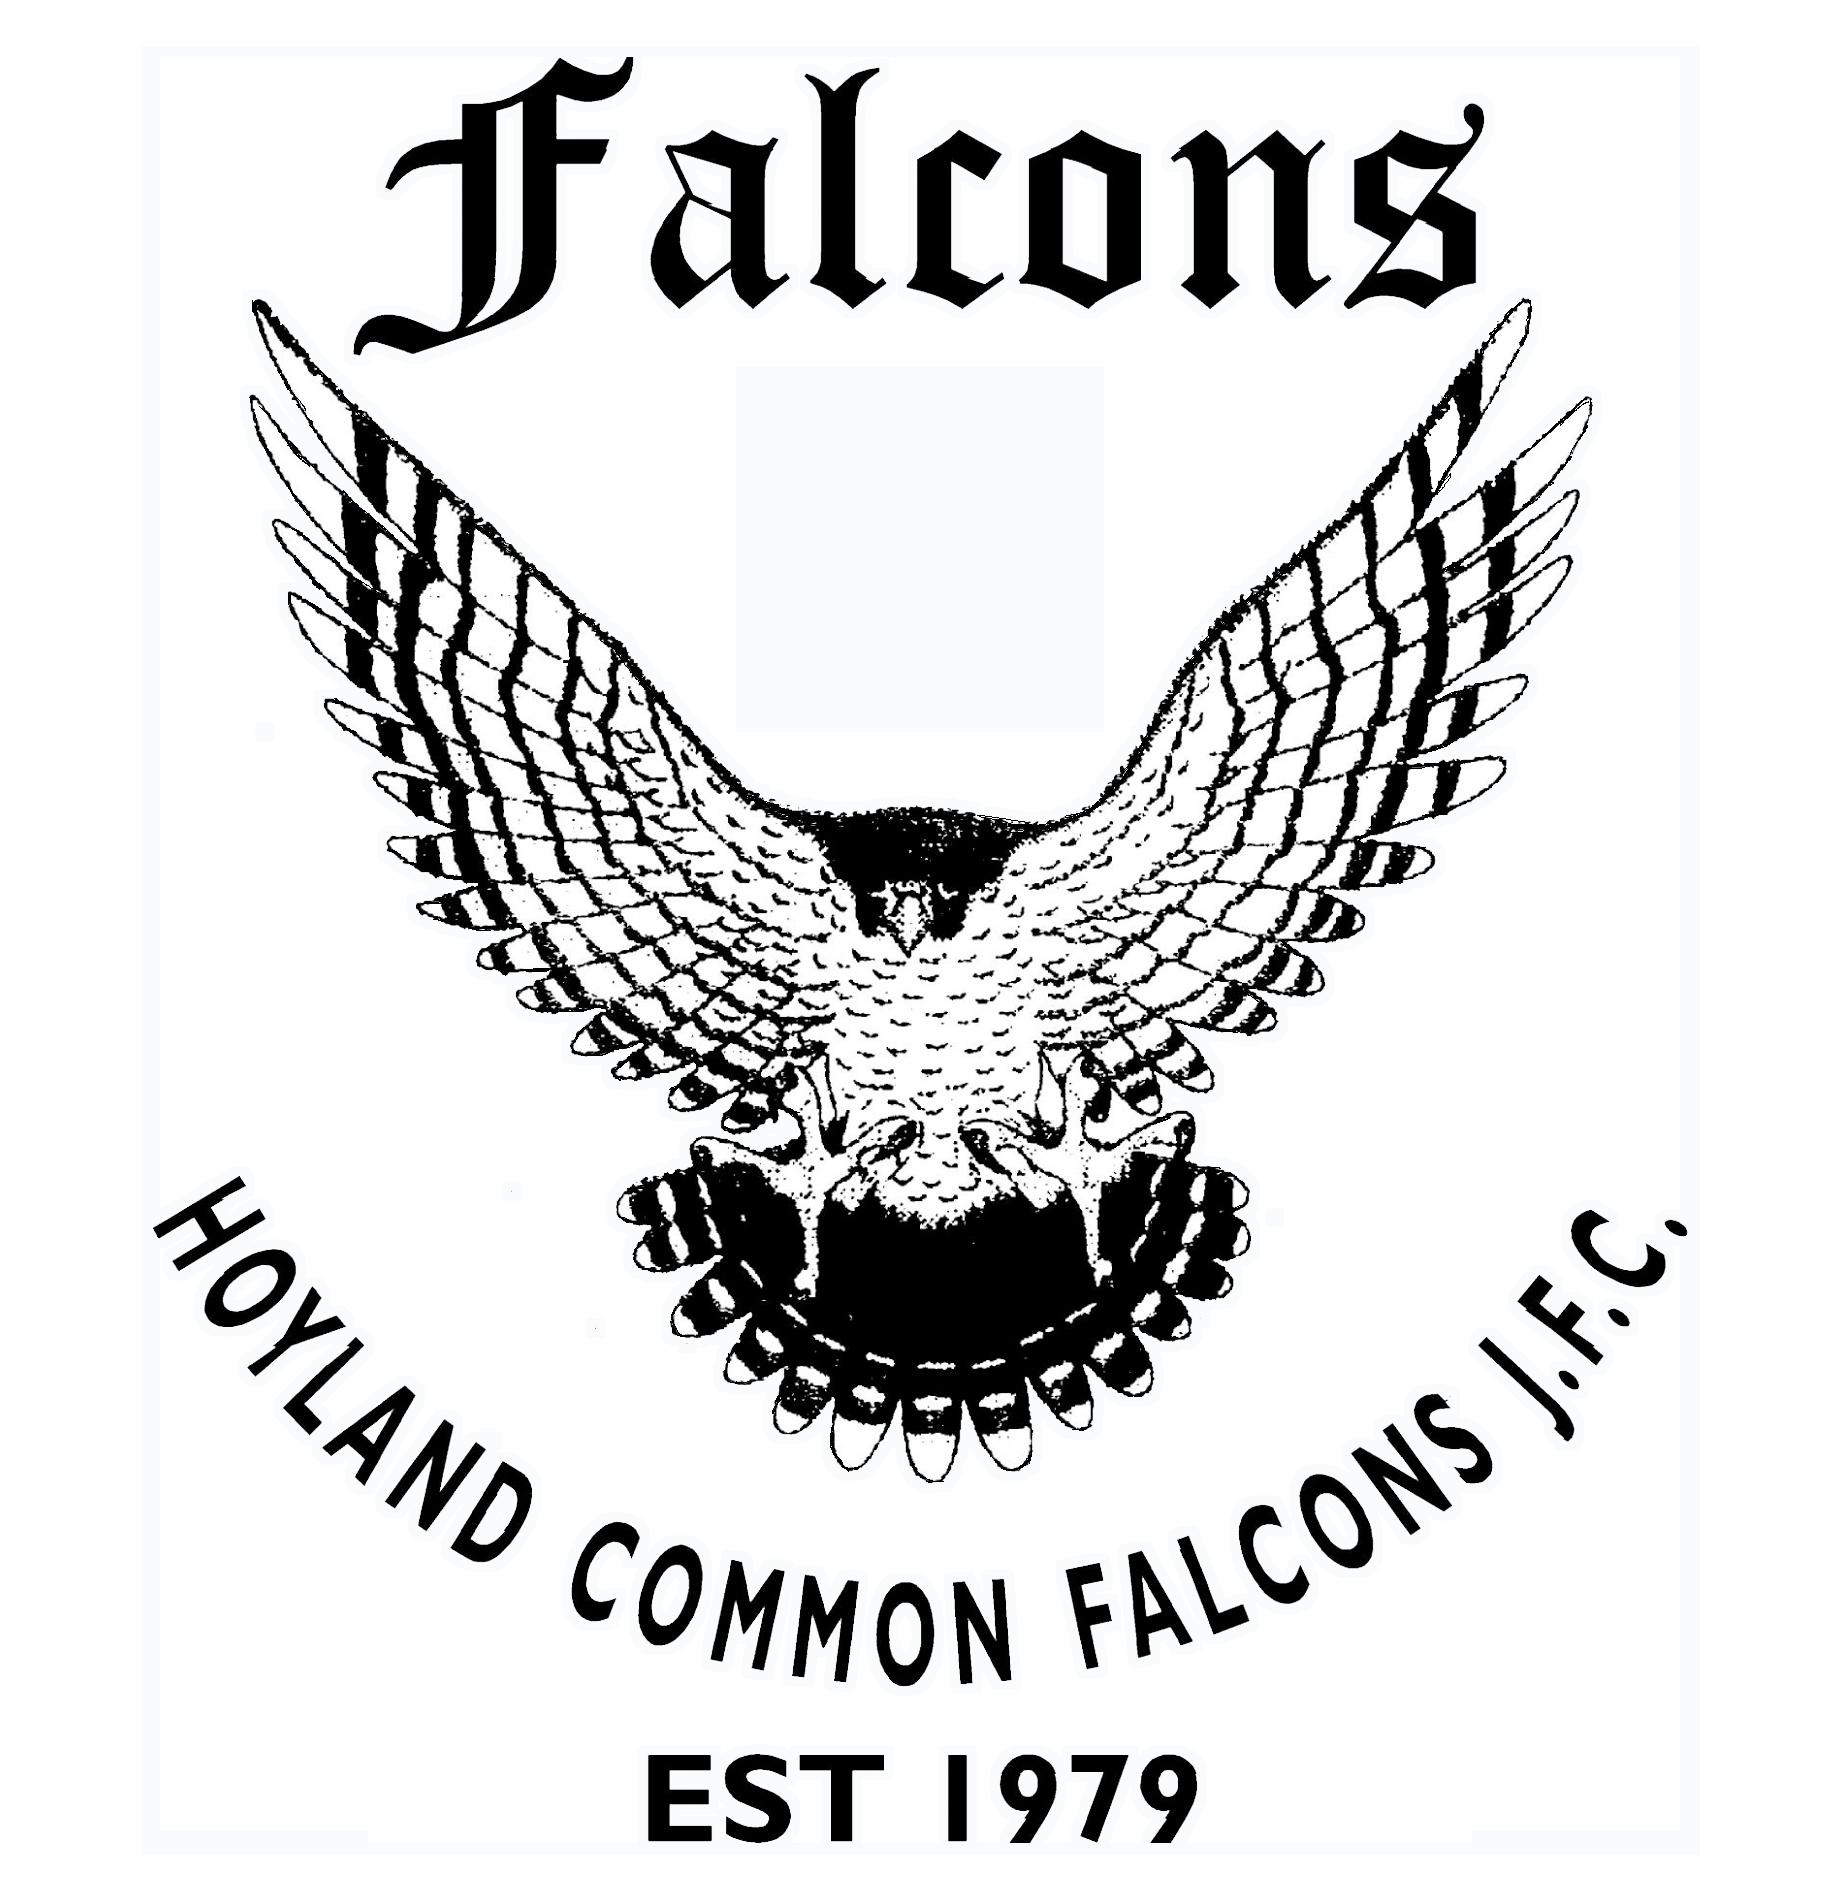 Hoyland Common Falcons JFC